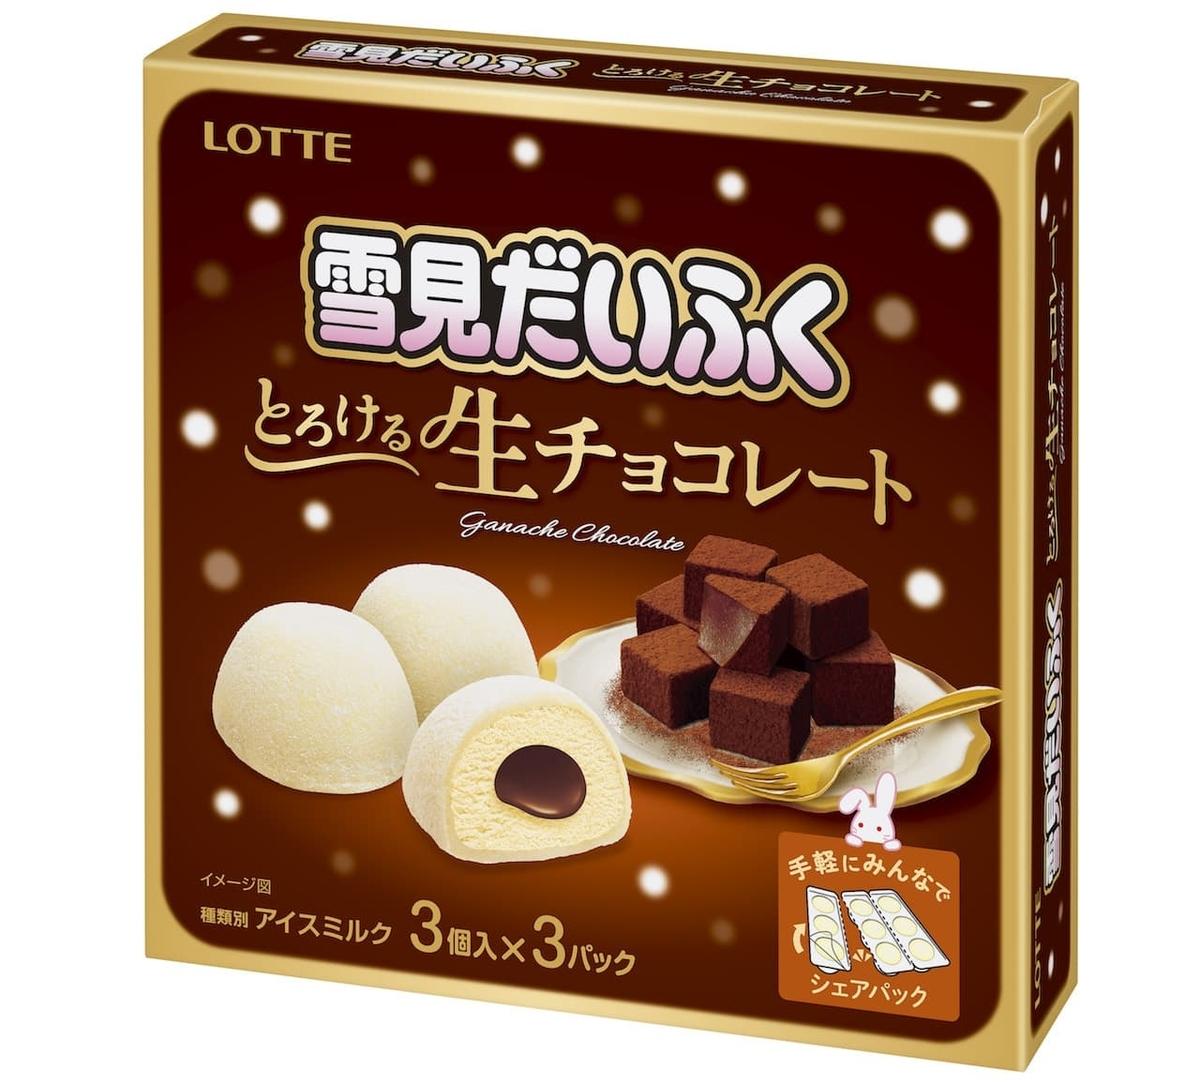 f:id:hashimoto_neko:20200830020453j:plain